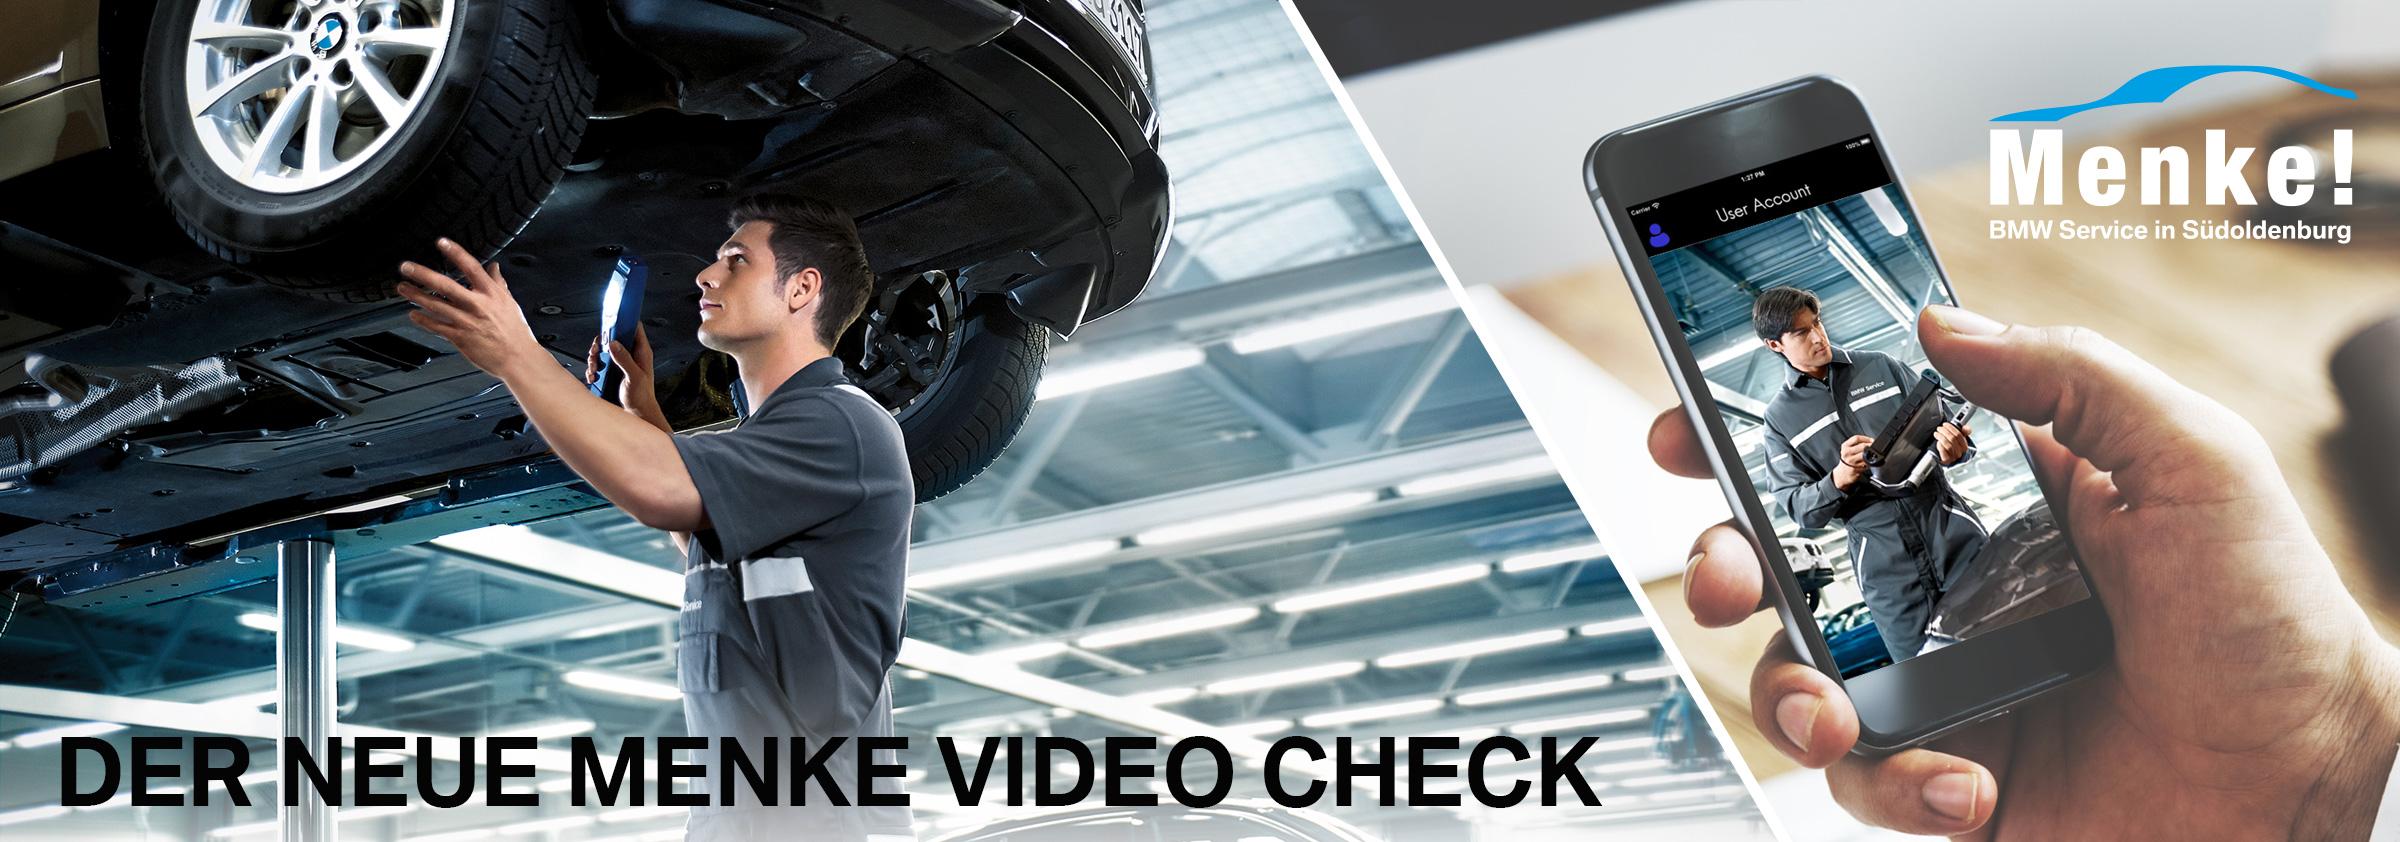 Video-Check